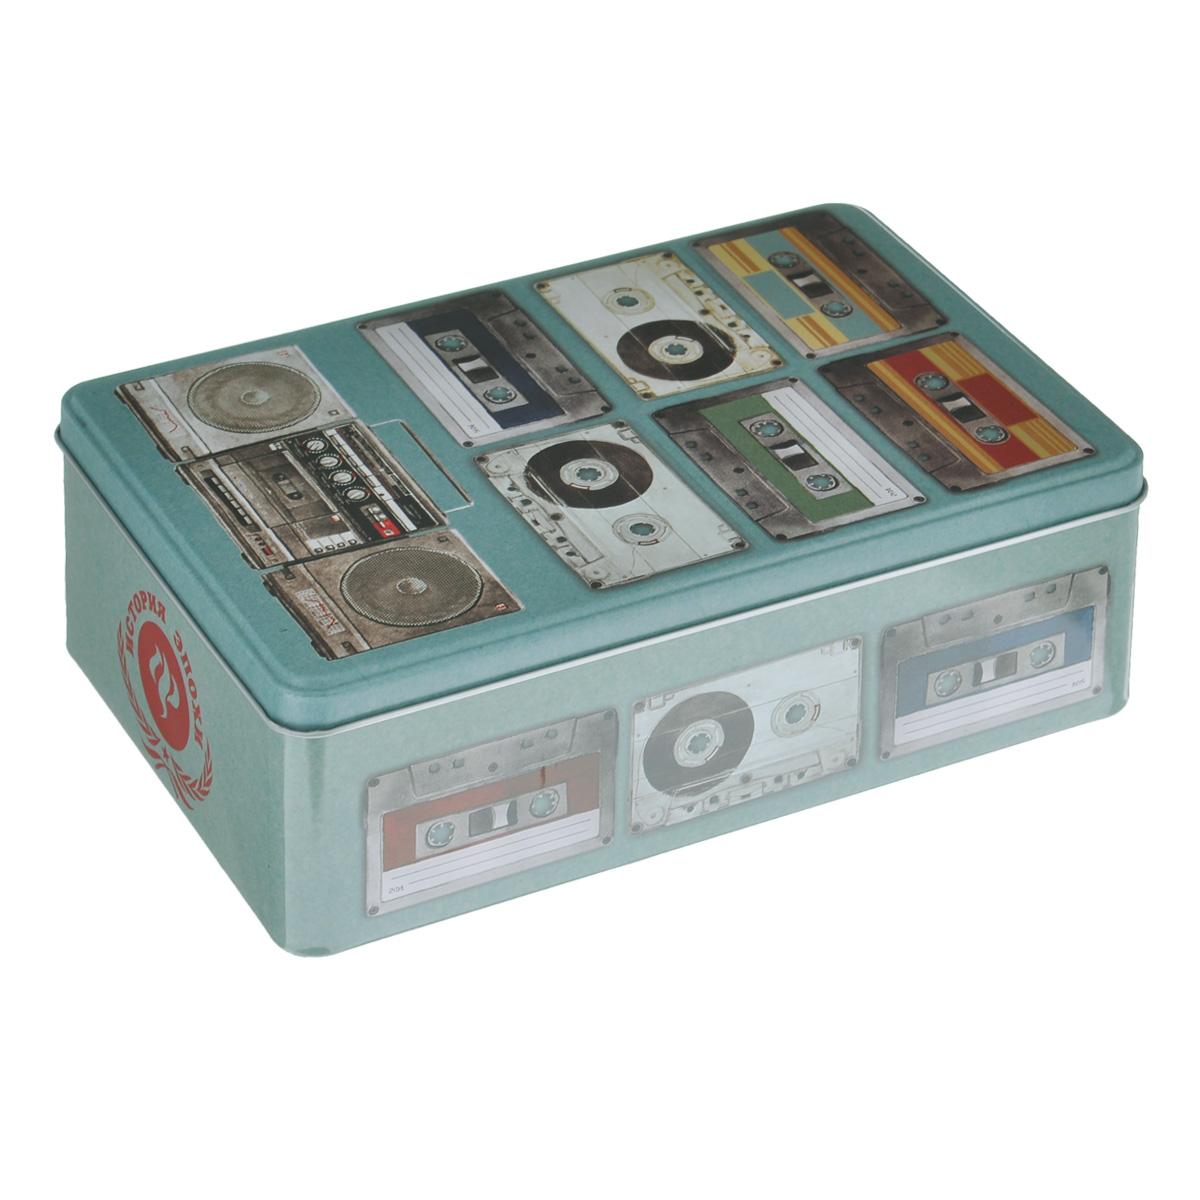 "Коробка для хранения Феникс-презент ""Аудиокассеты"", 20 х 13 х 6,5 см"